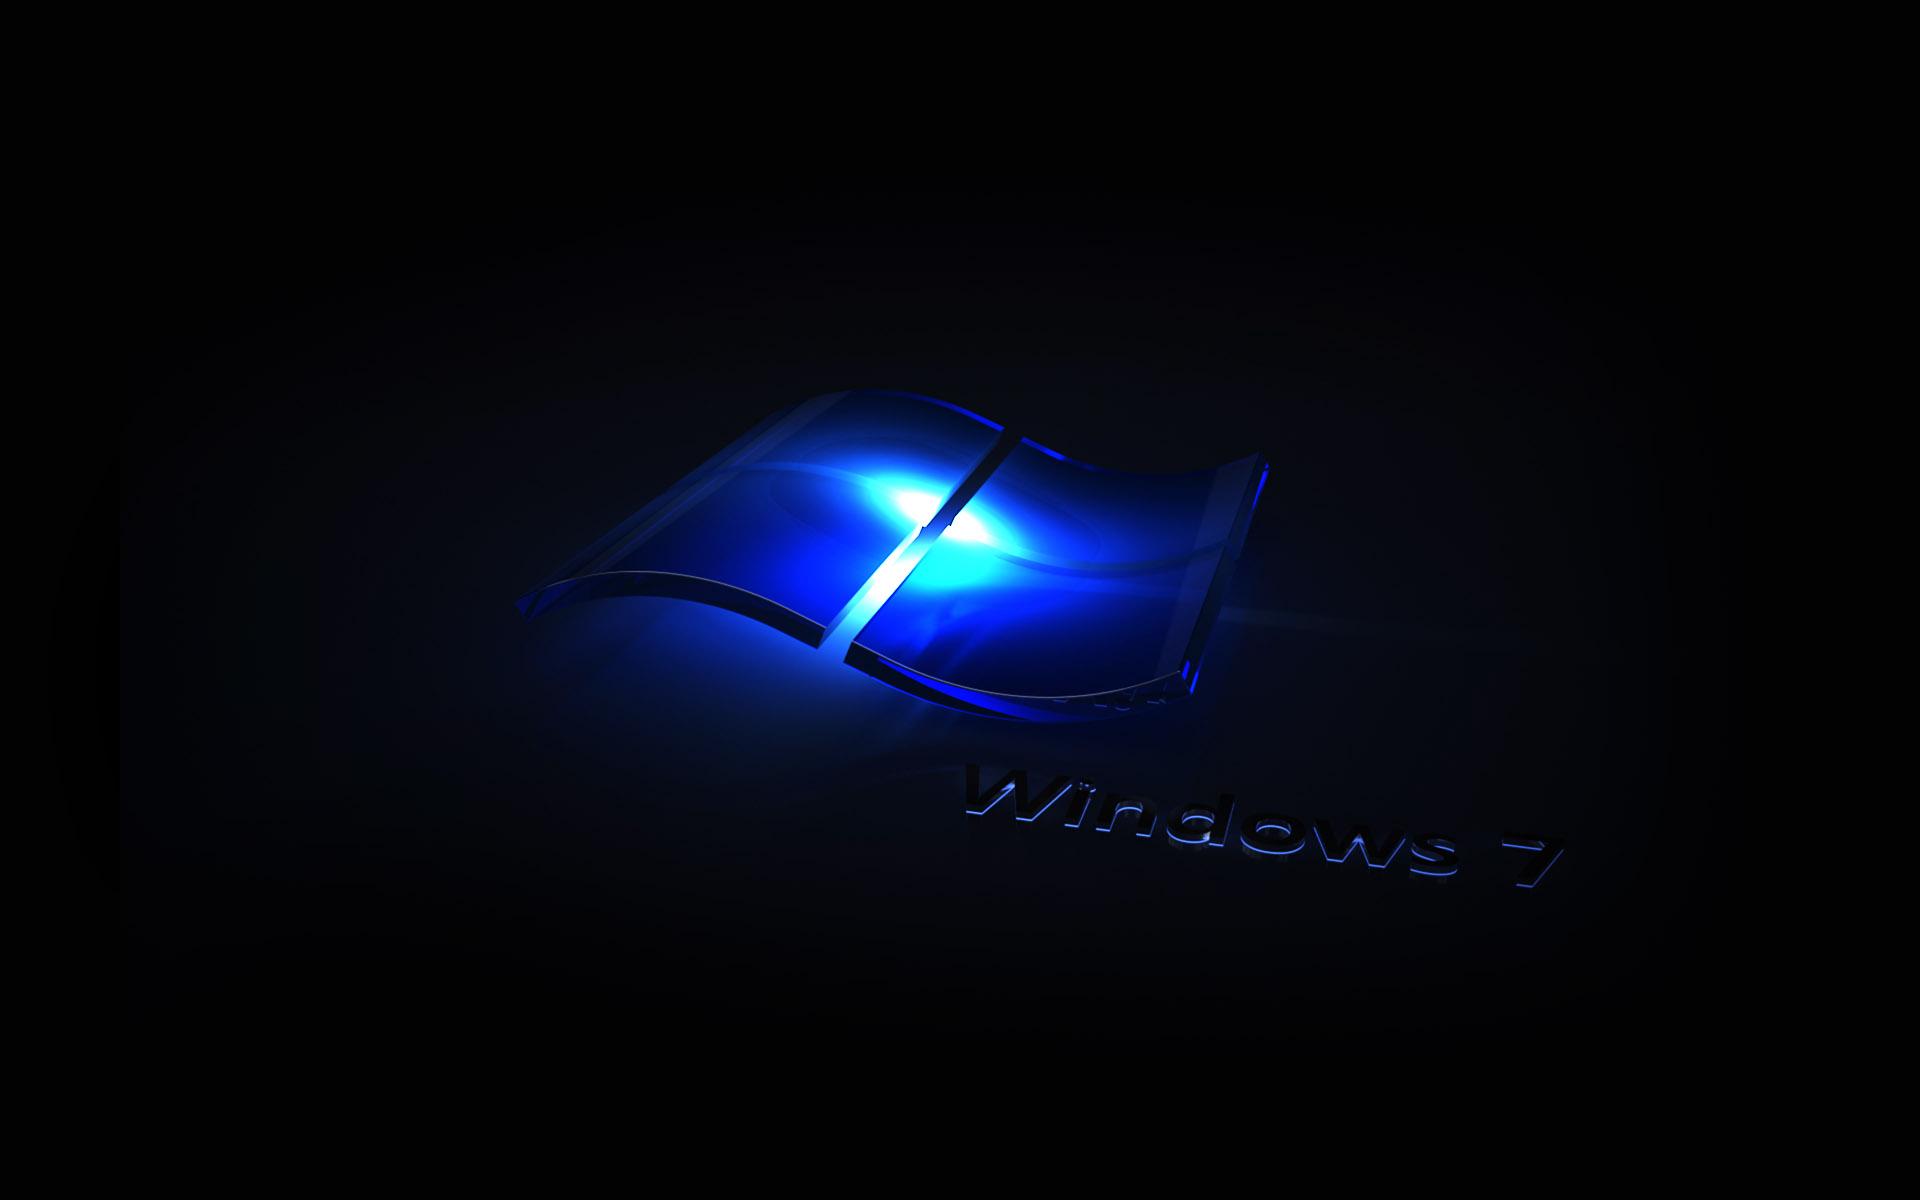 1920x1200 Px Windows 7 Blue Neon Wallpaper